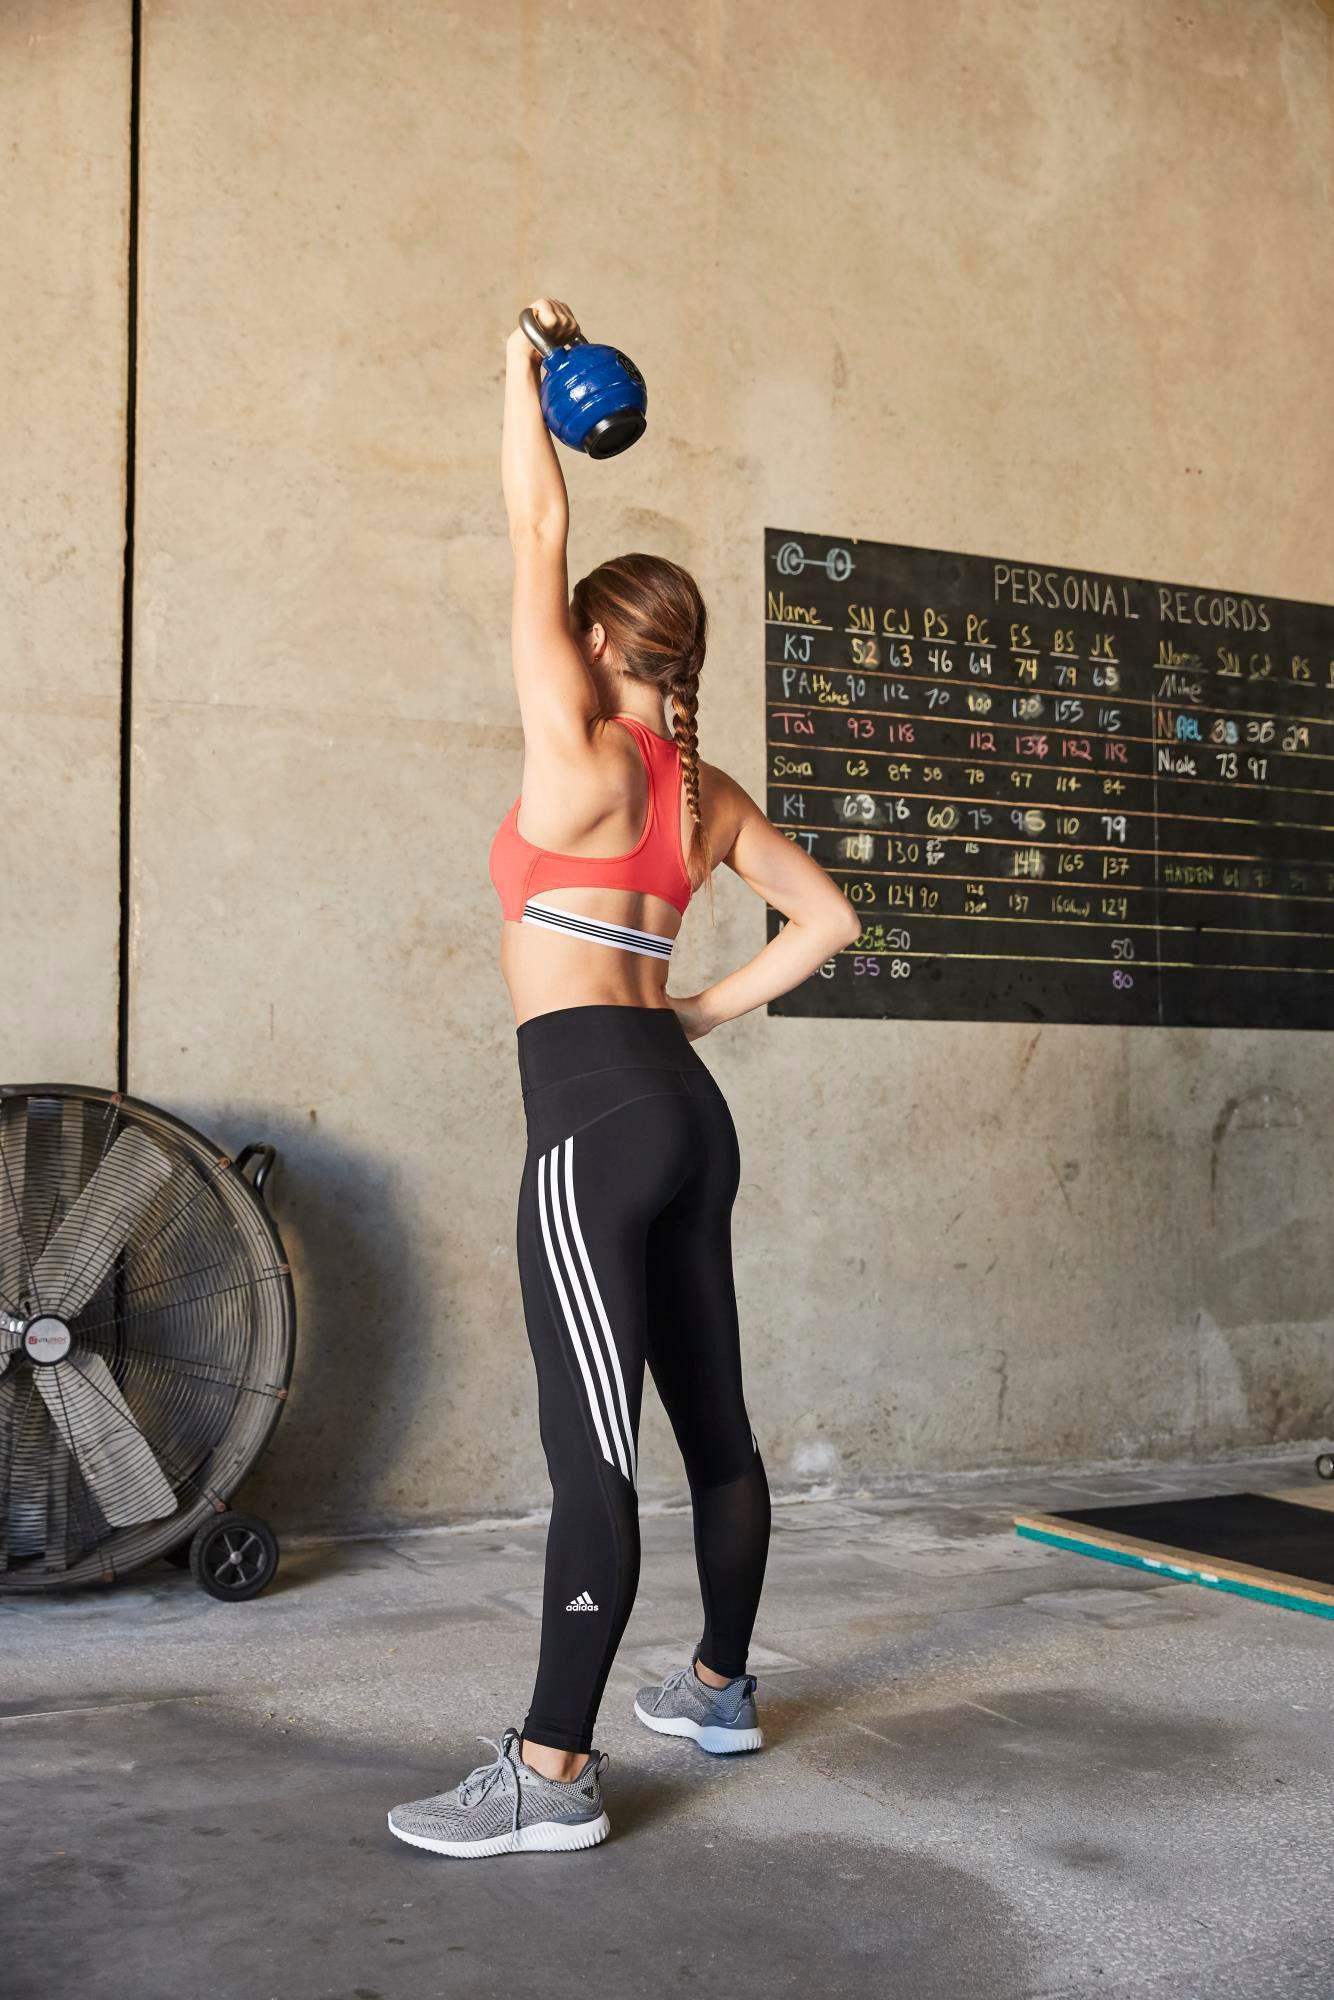 c9f690f6a51dc3 adidas Elieve This 3-stripe 7/8 Training Tights in Black - Lyst